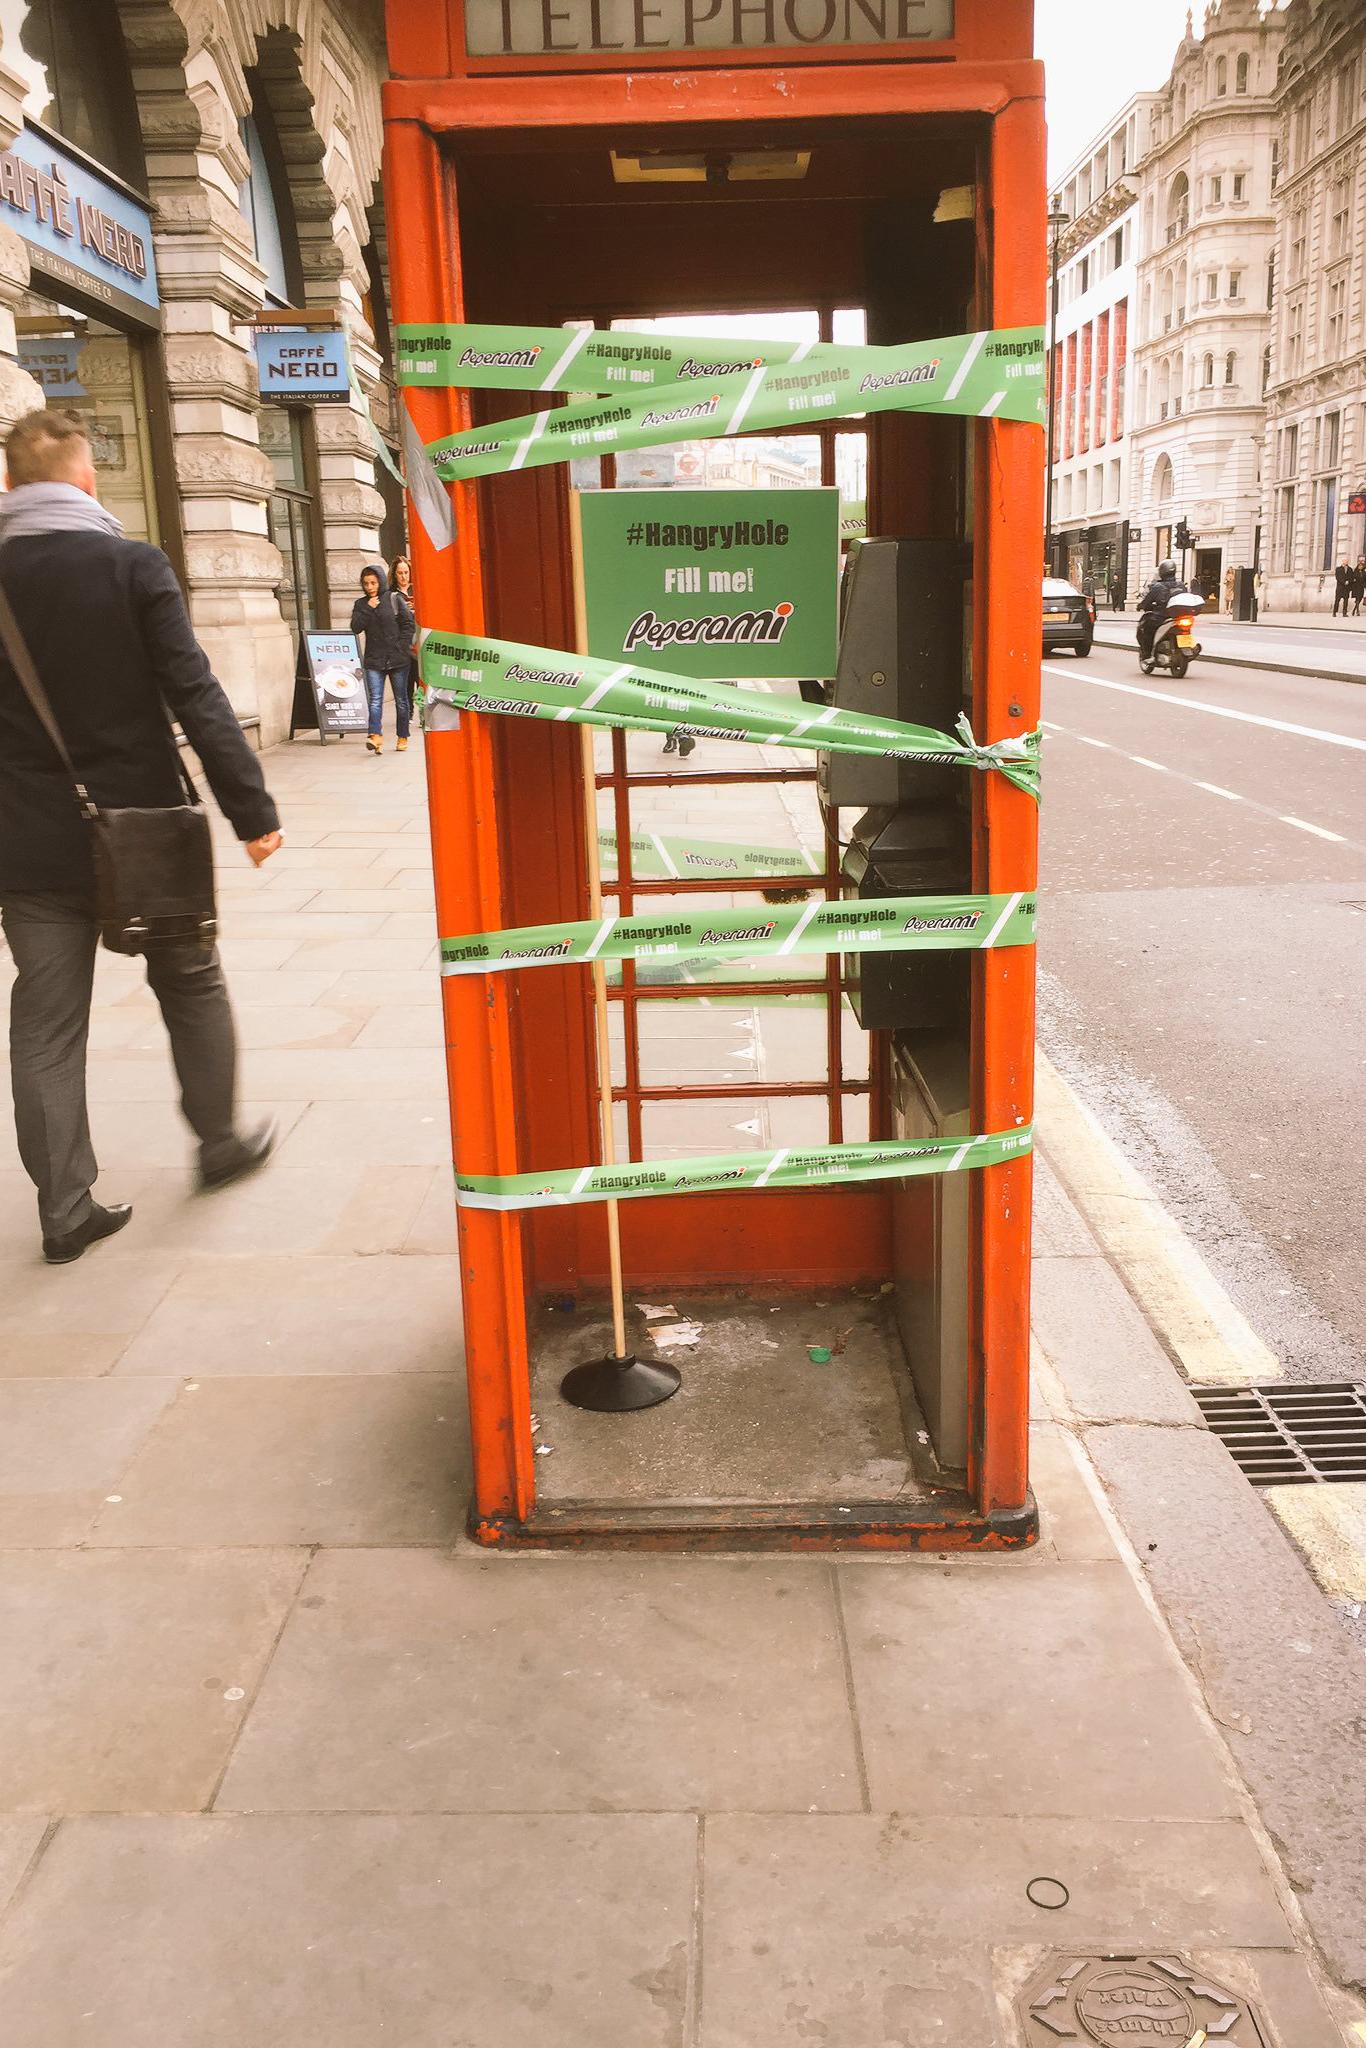 Peperami London porking #hangryhole telephone box pr stunt